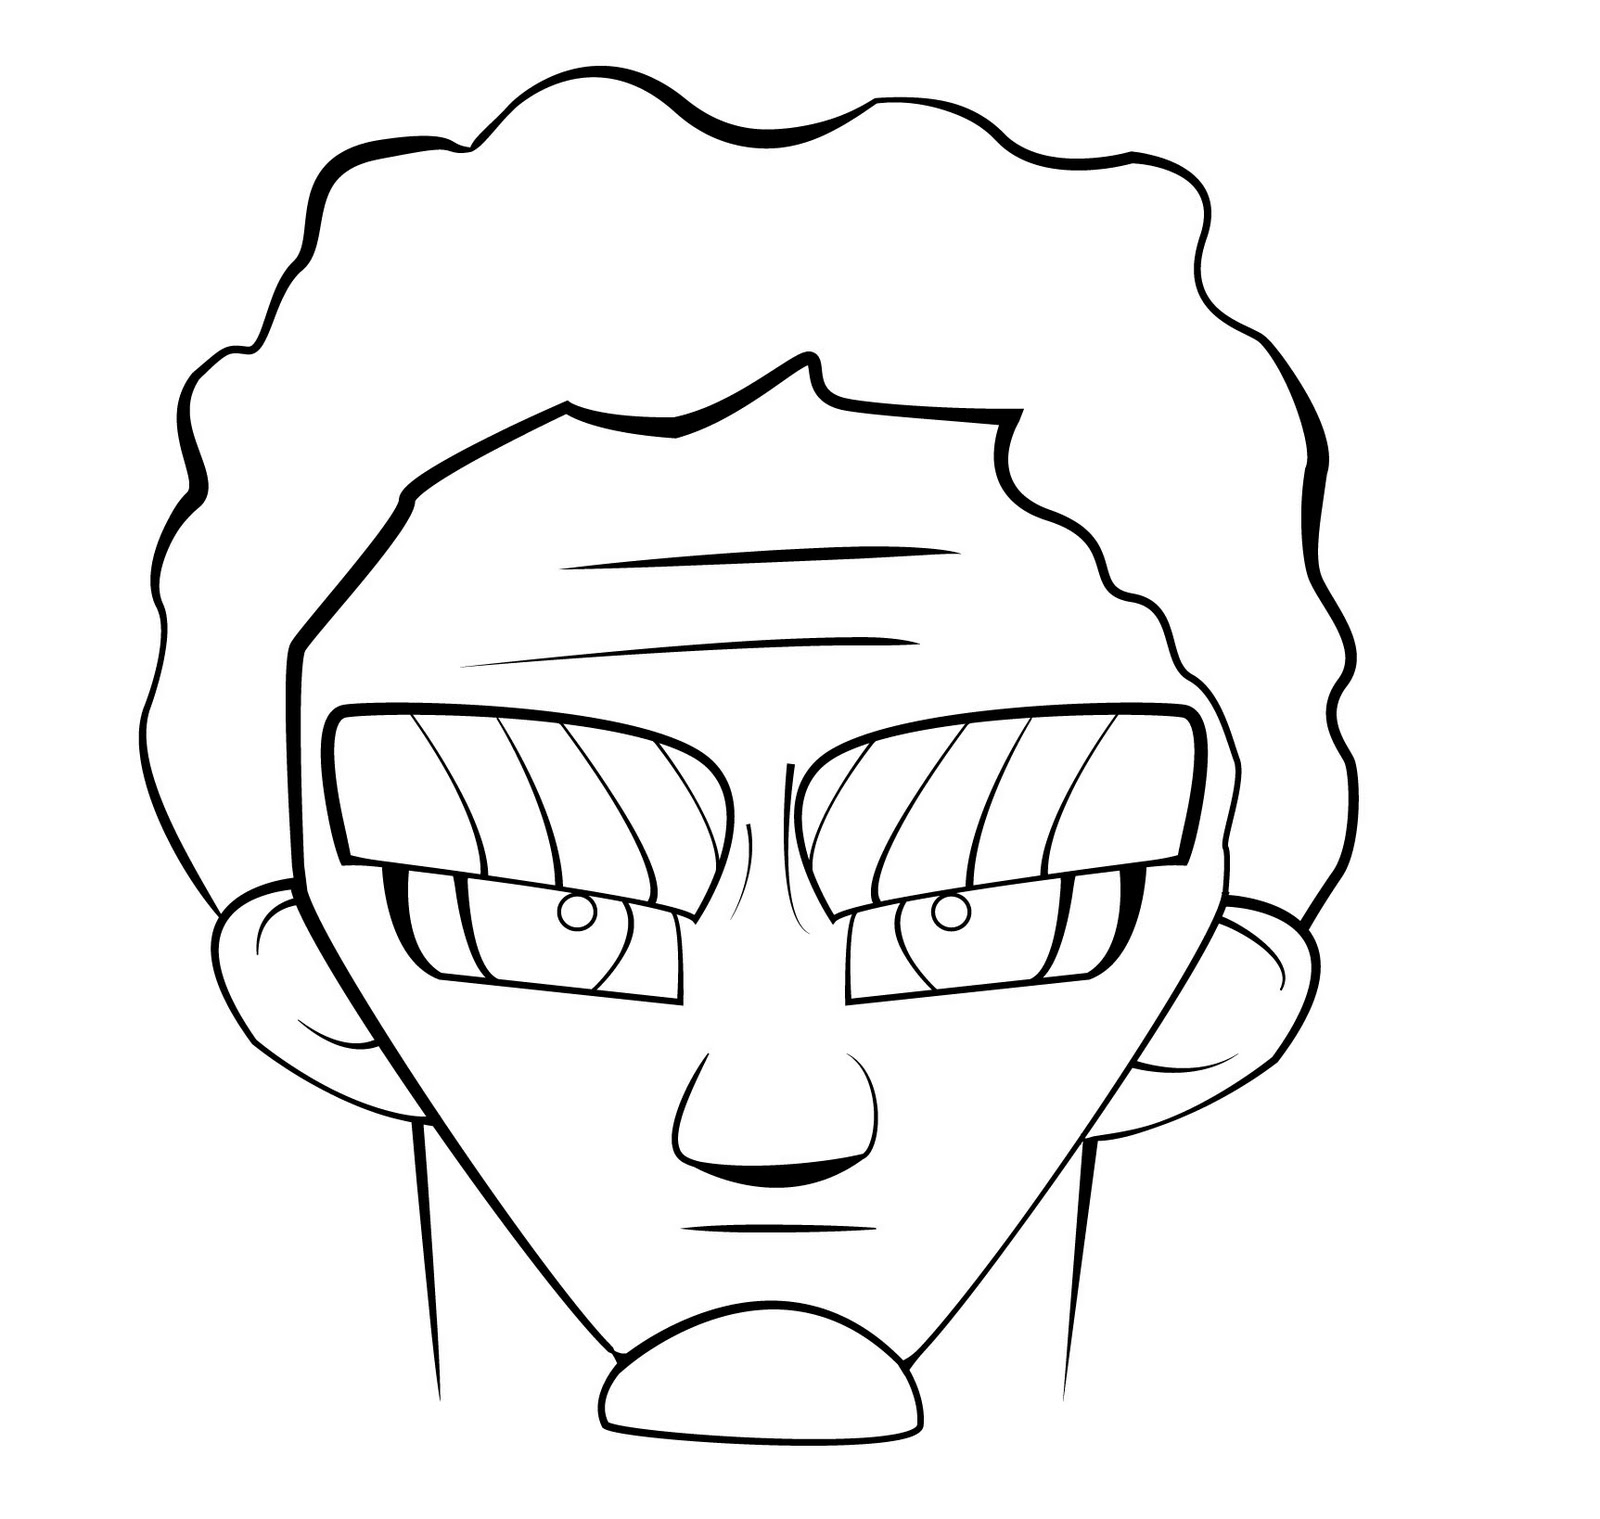 u0026quot shamal artist blog u0026quot   cartoon face i did with adobe